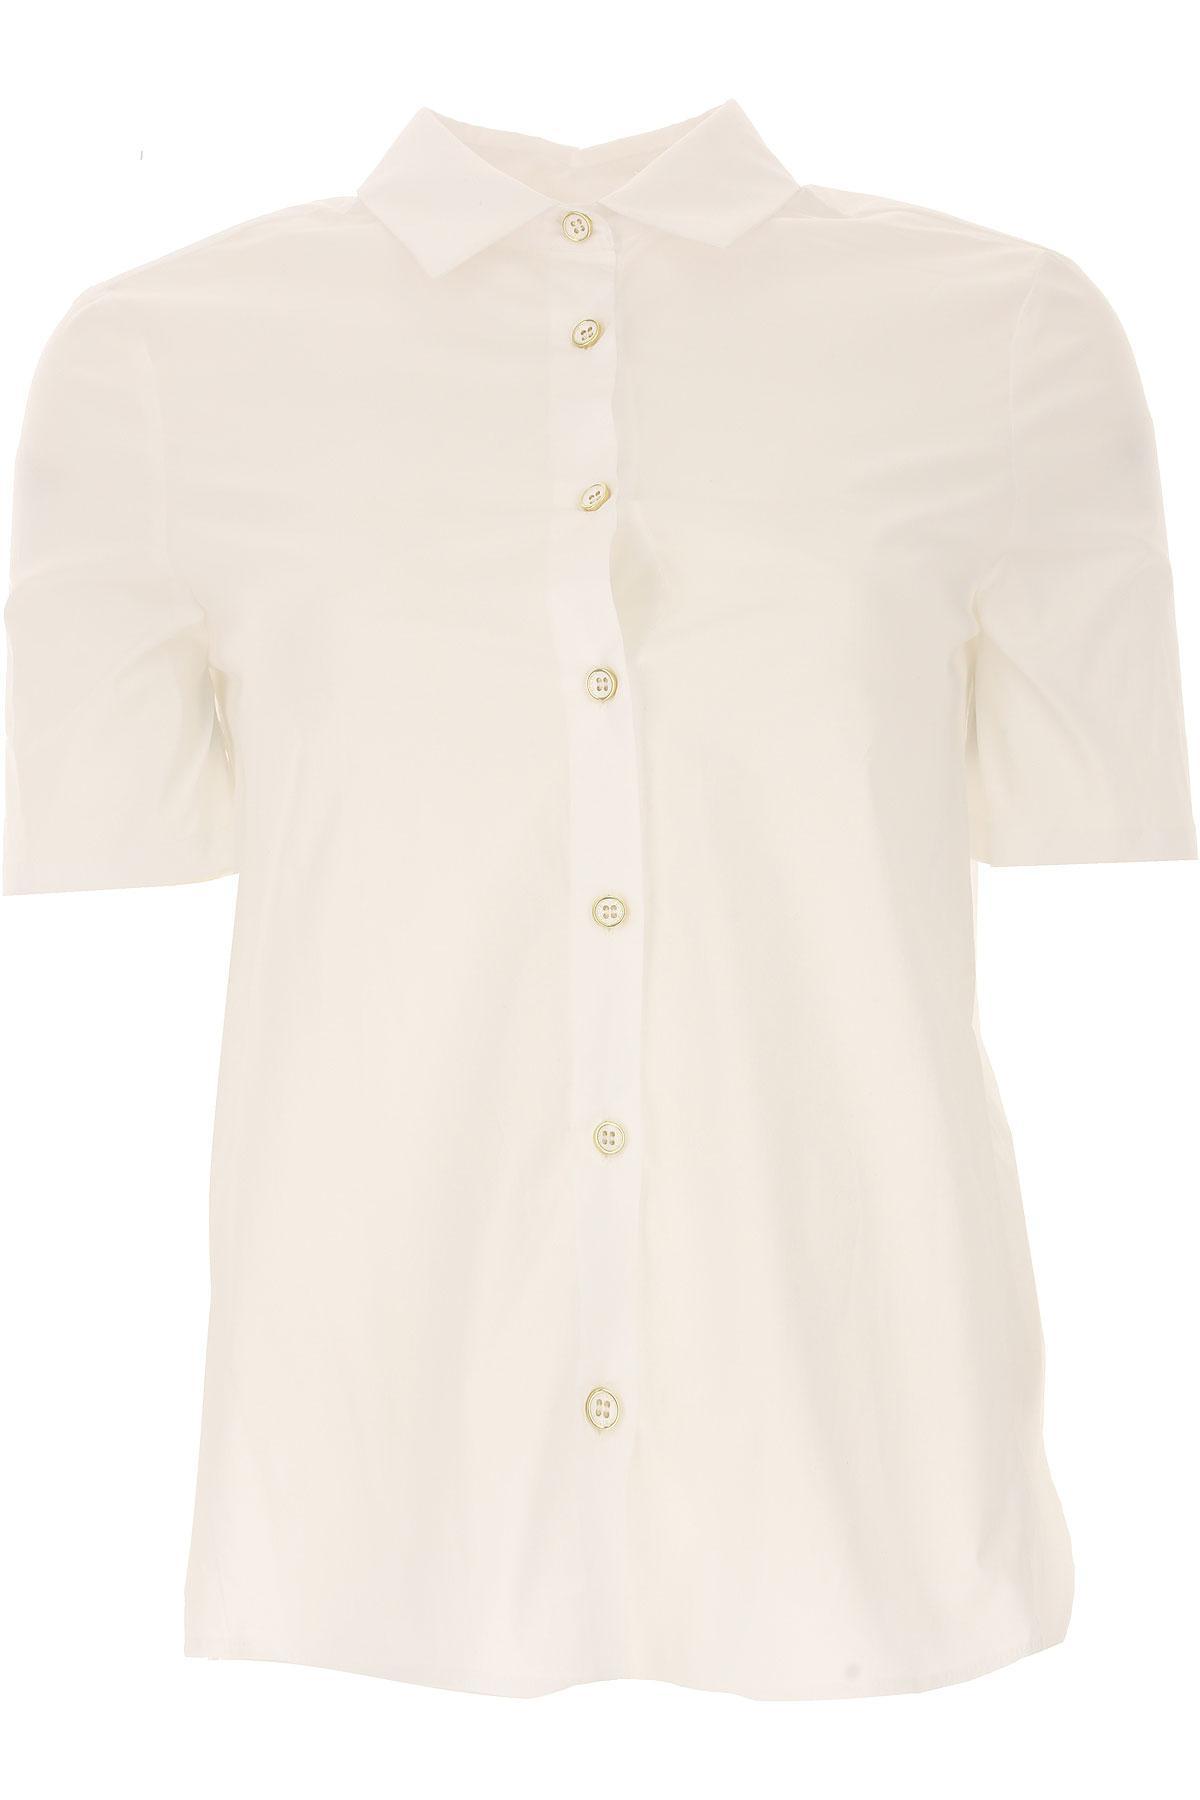 1ffd07340de6 Twin Set - Multicolor Clothing For Women - Lyst